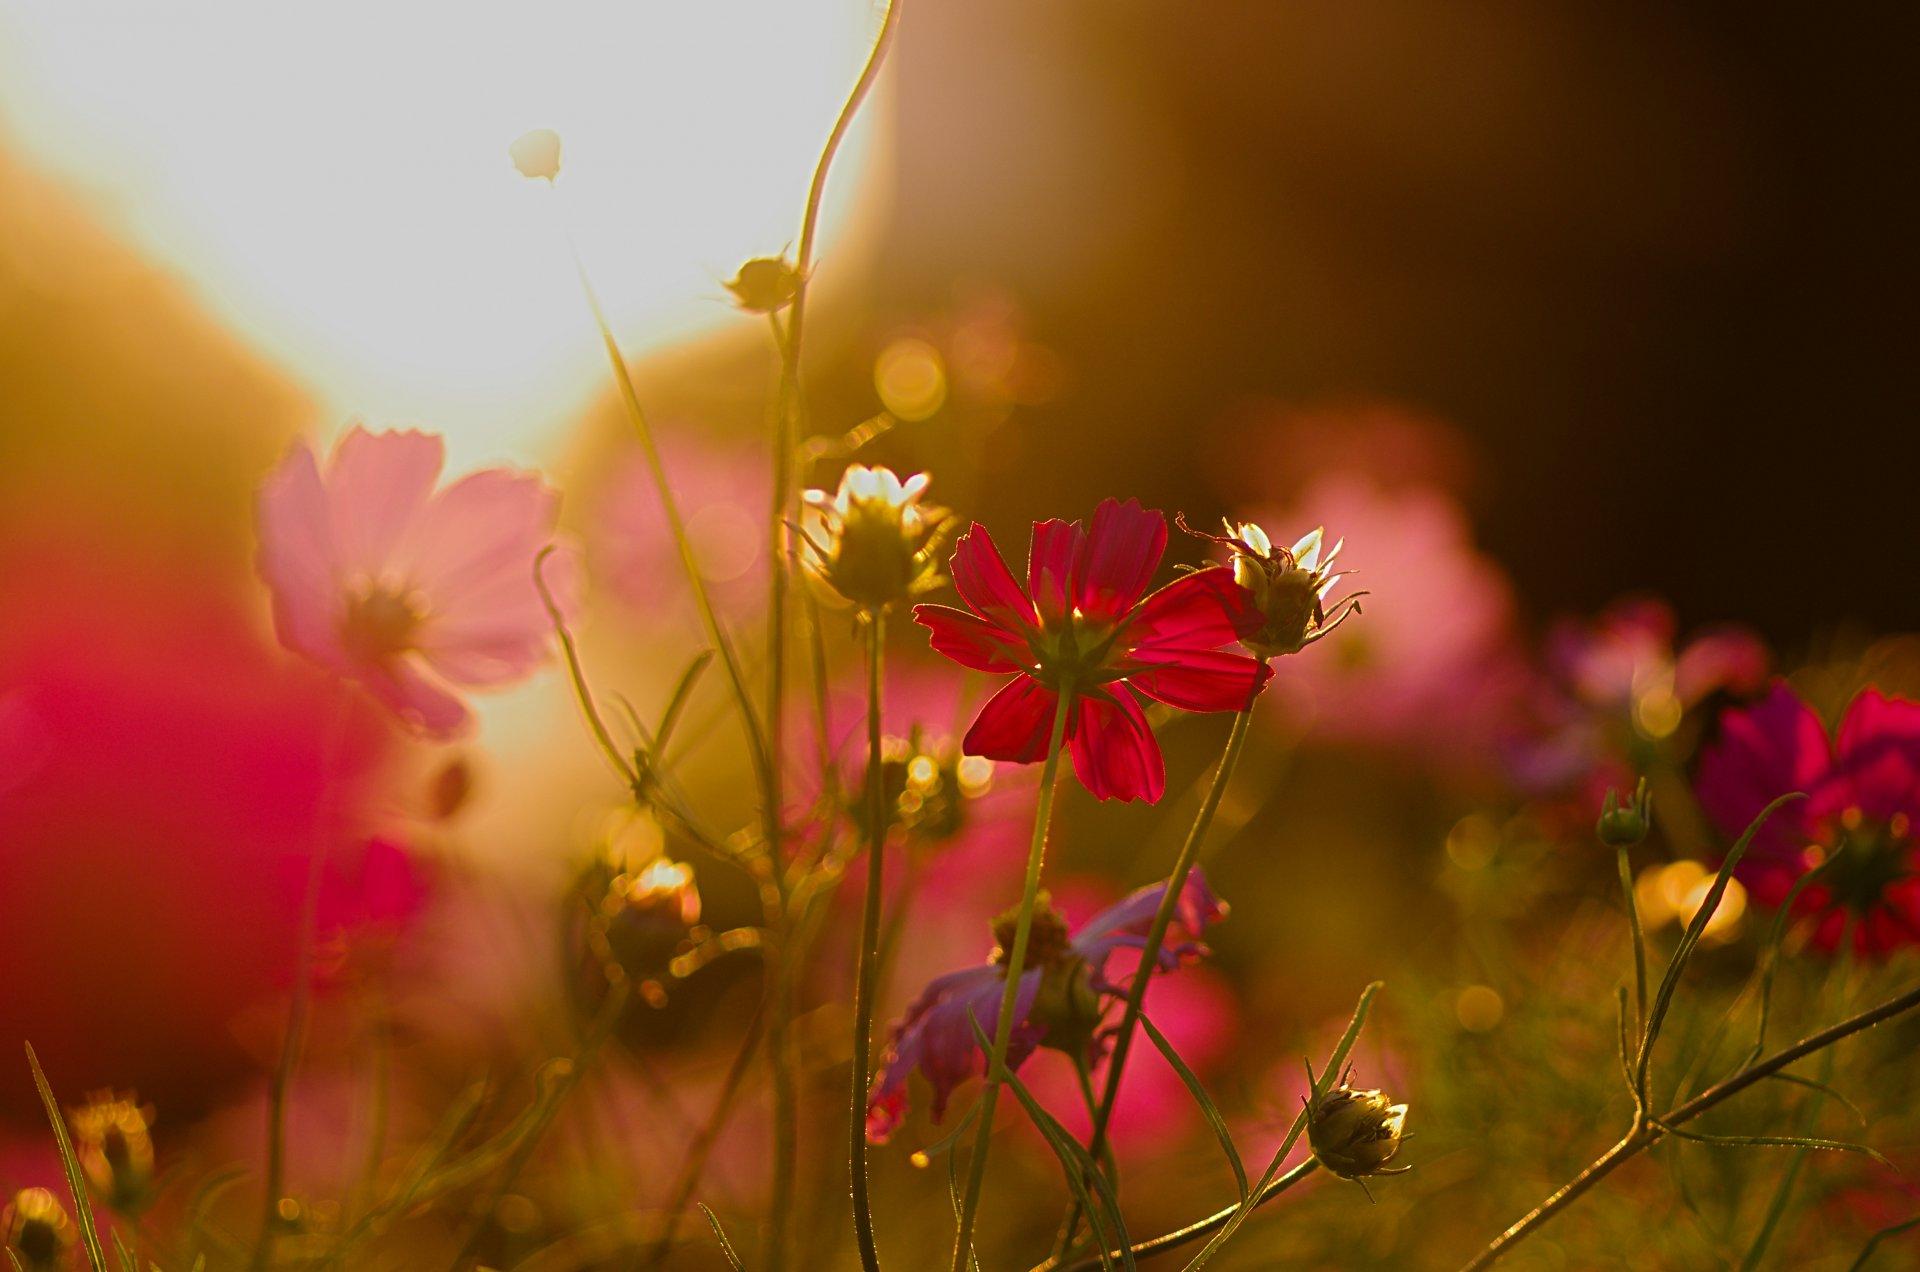 Картинки цветы на фоне заката, спокойной ночи мой